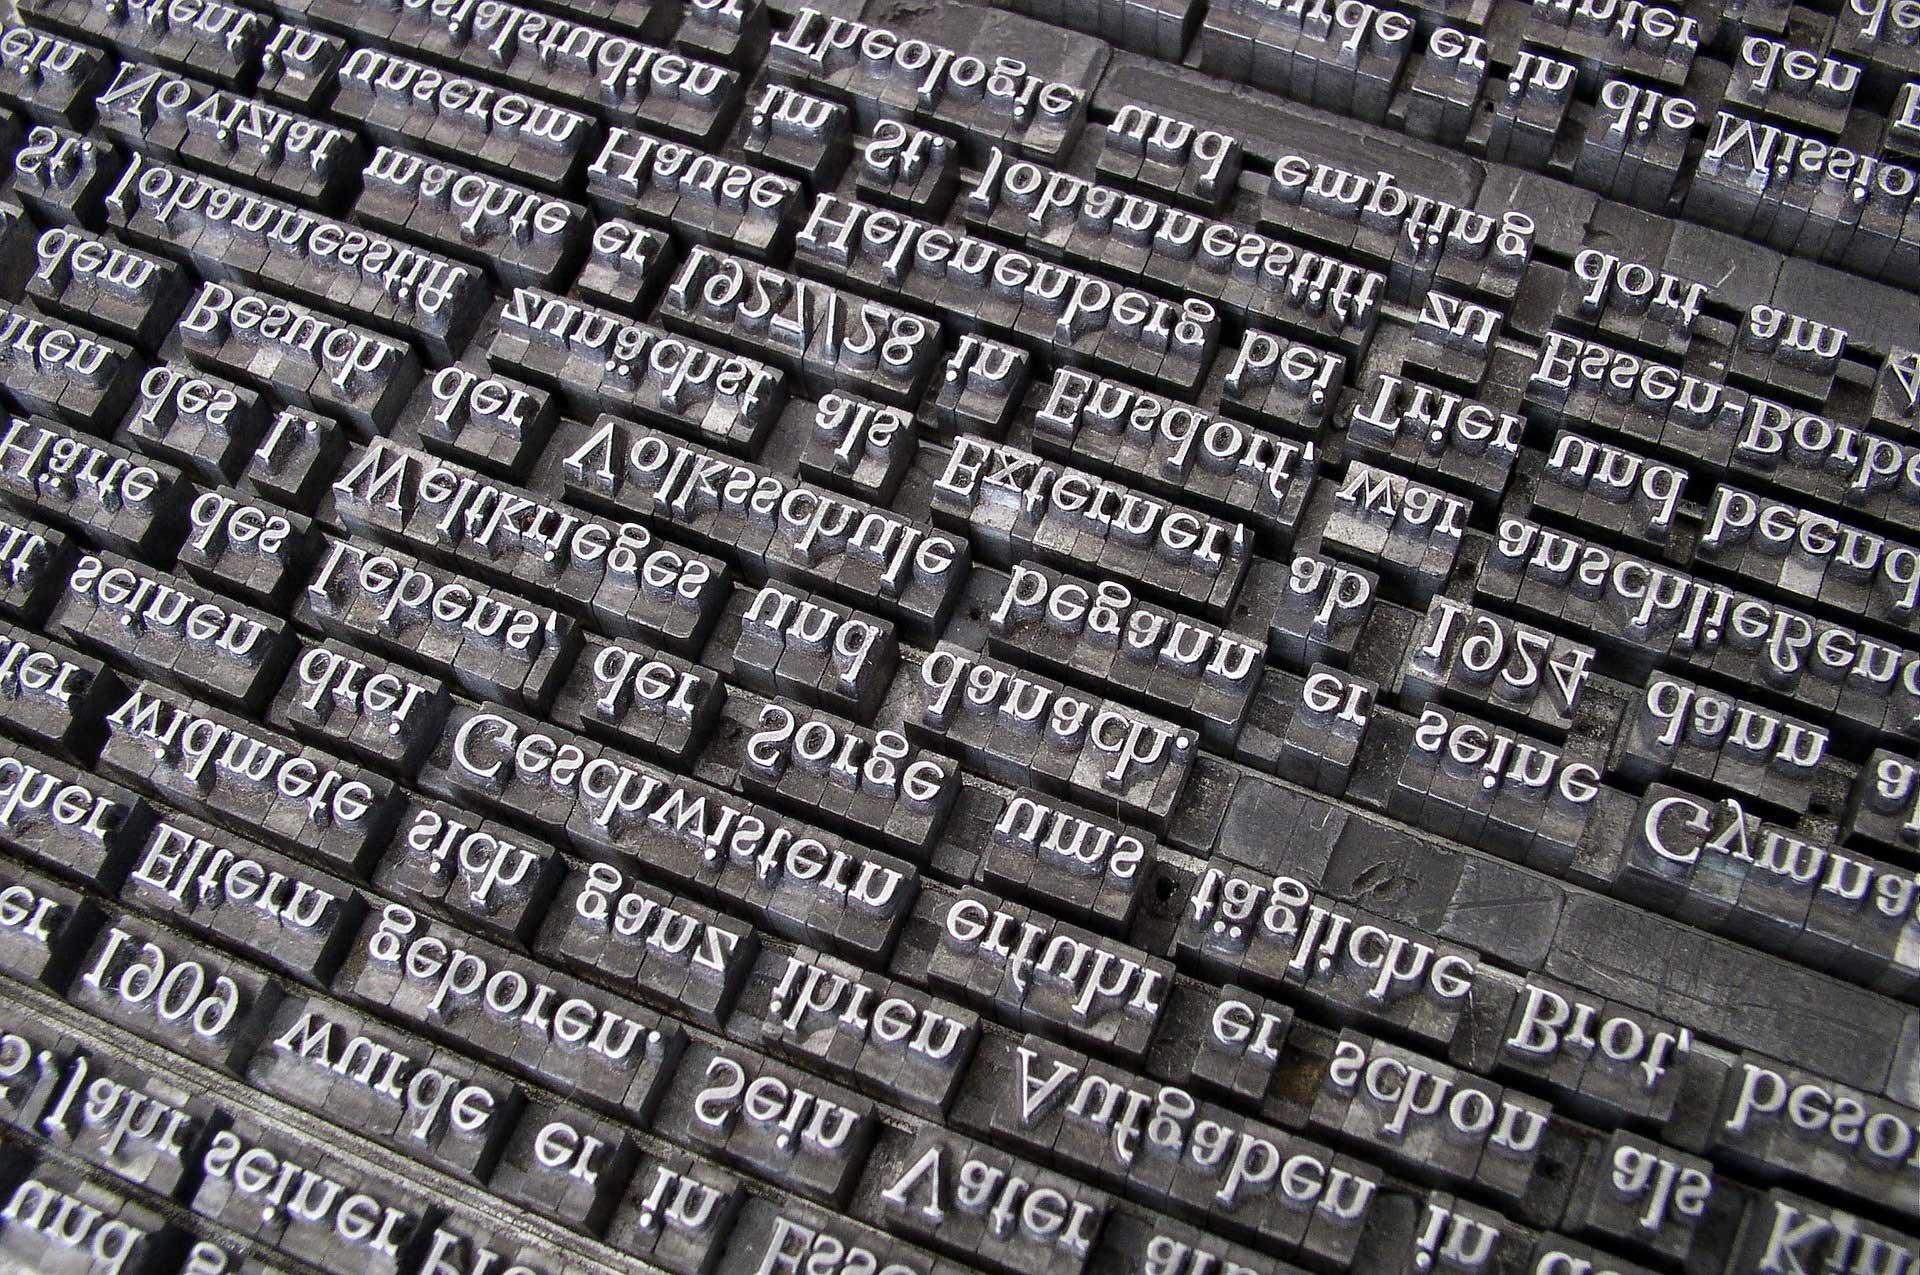 Procurement Language on Digital Marketplace Criticised